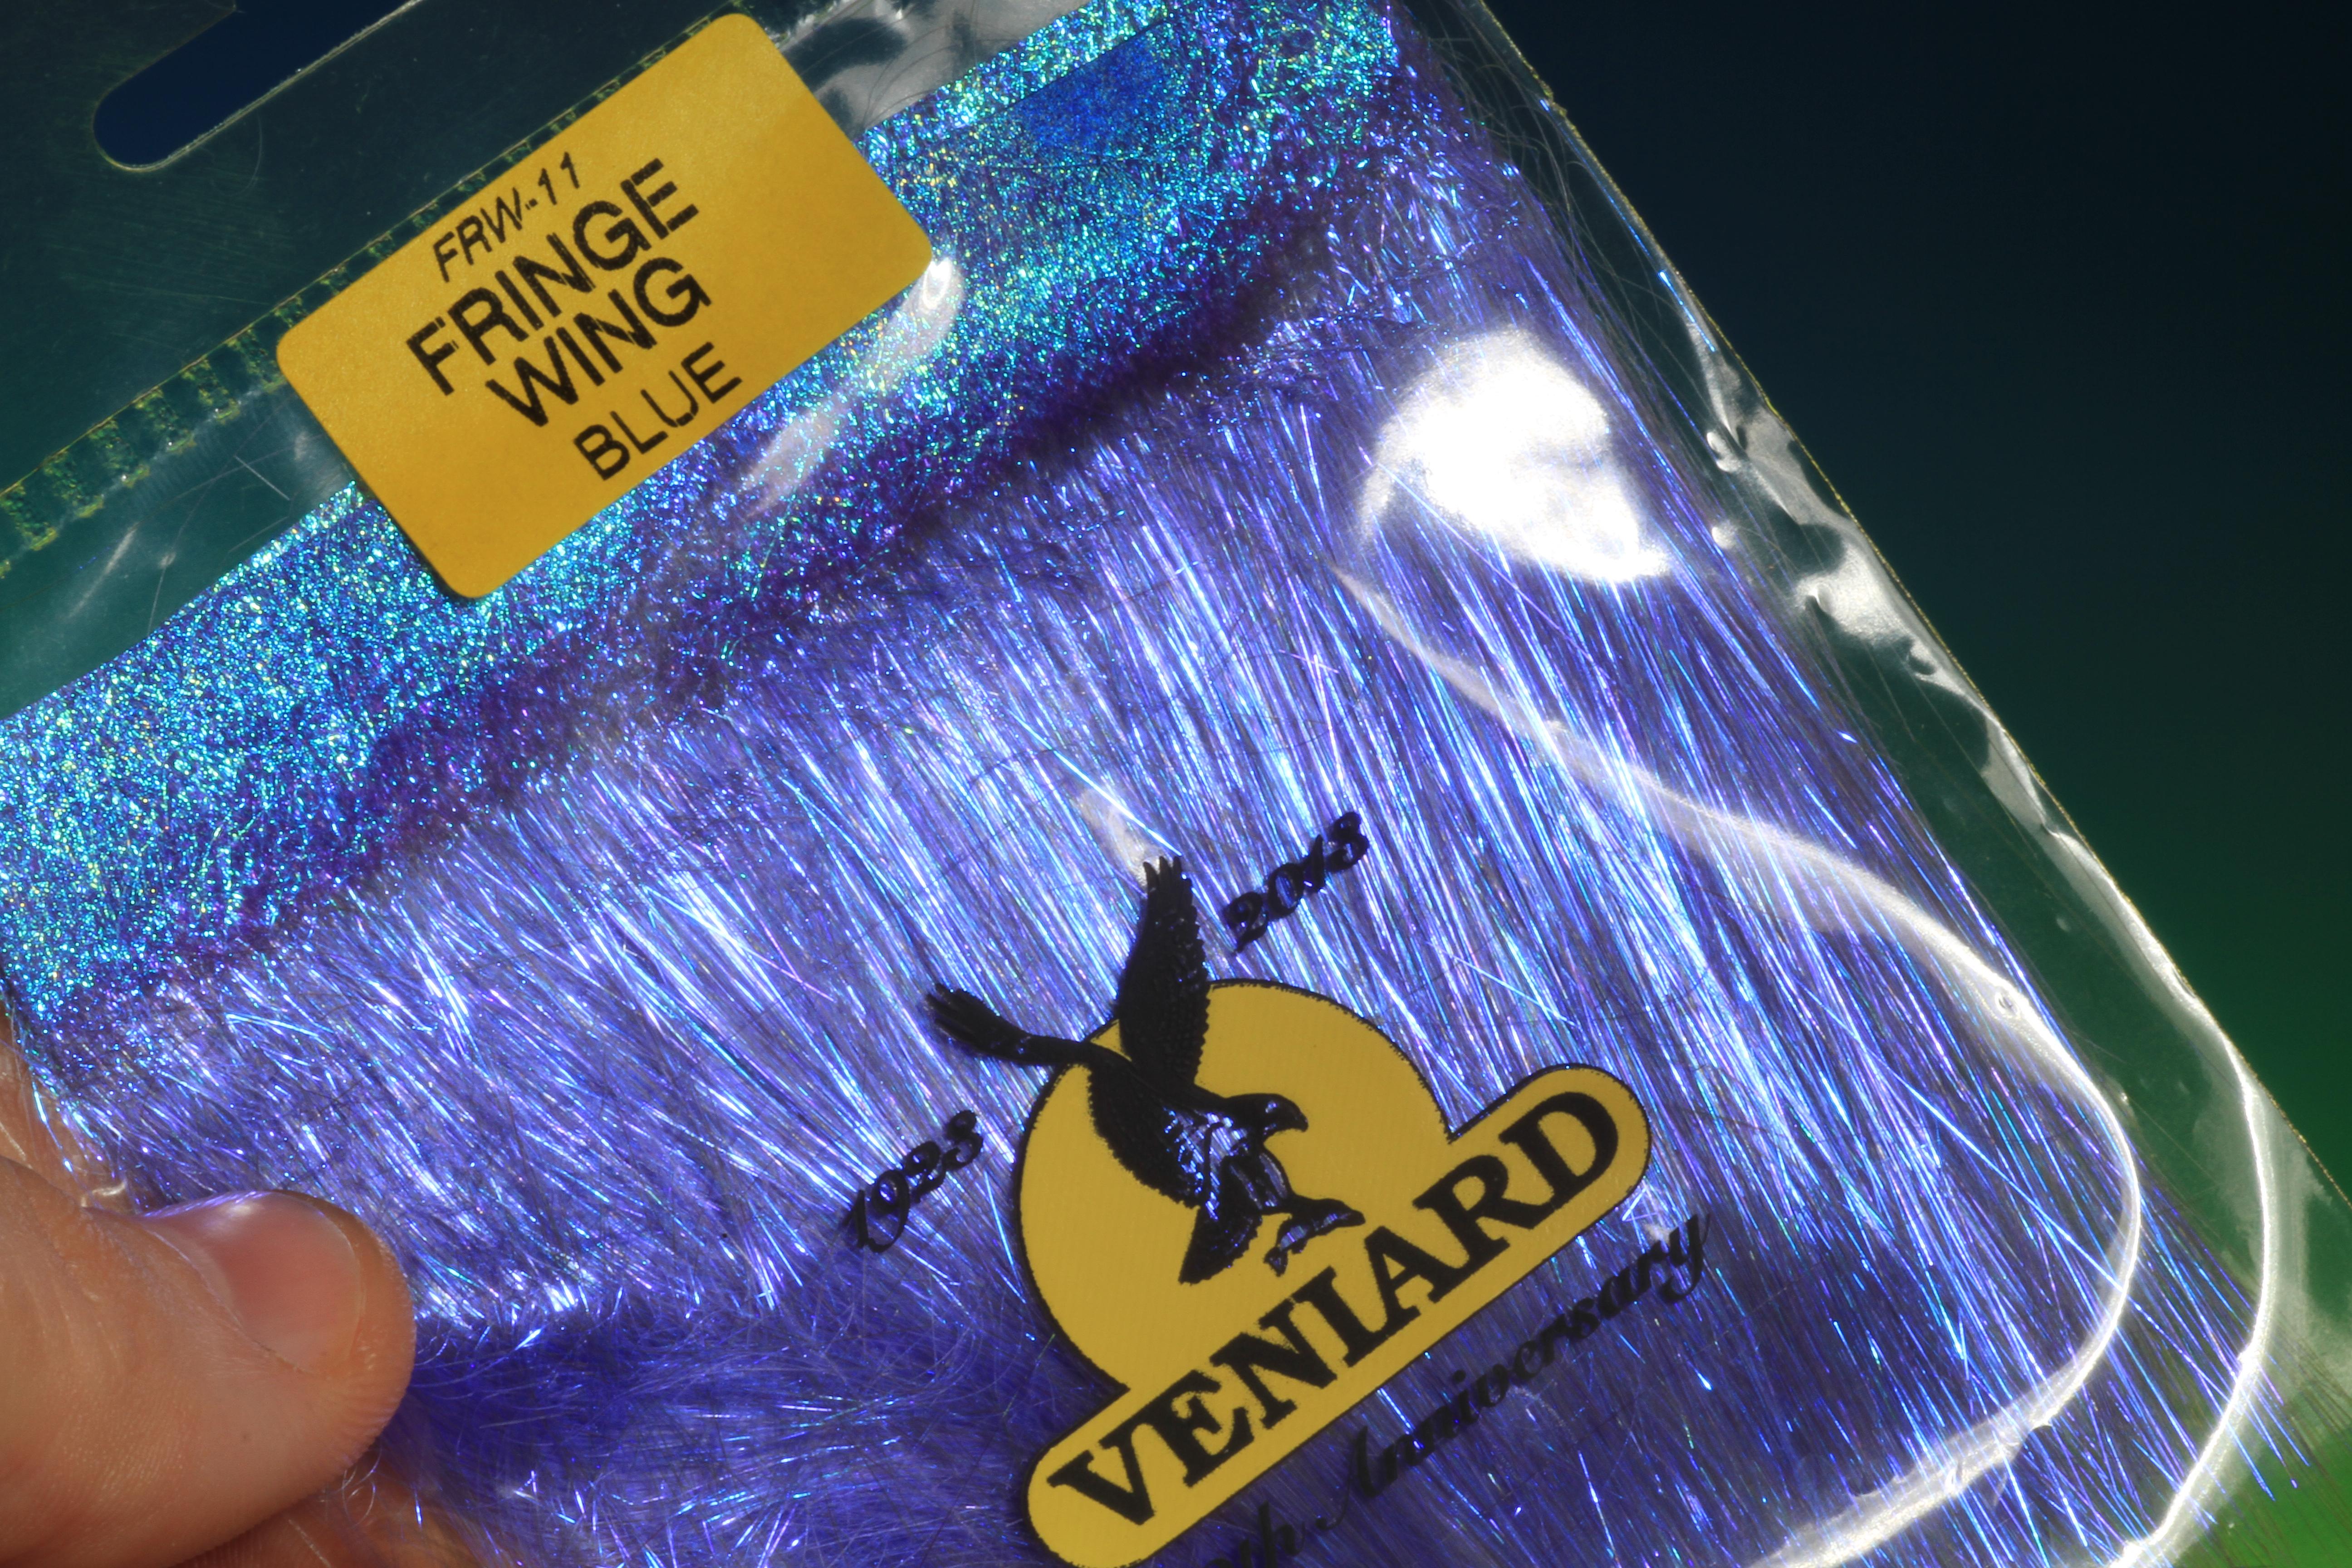 veniard fringe wing